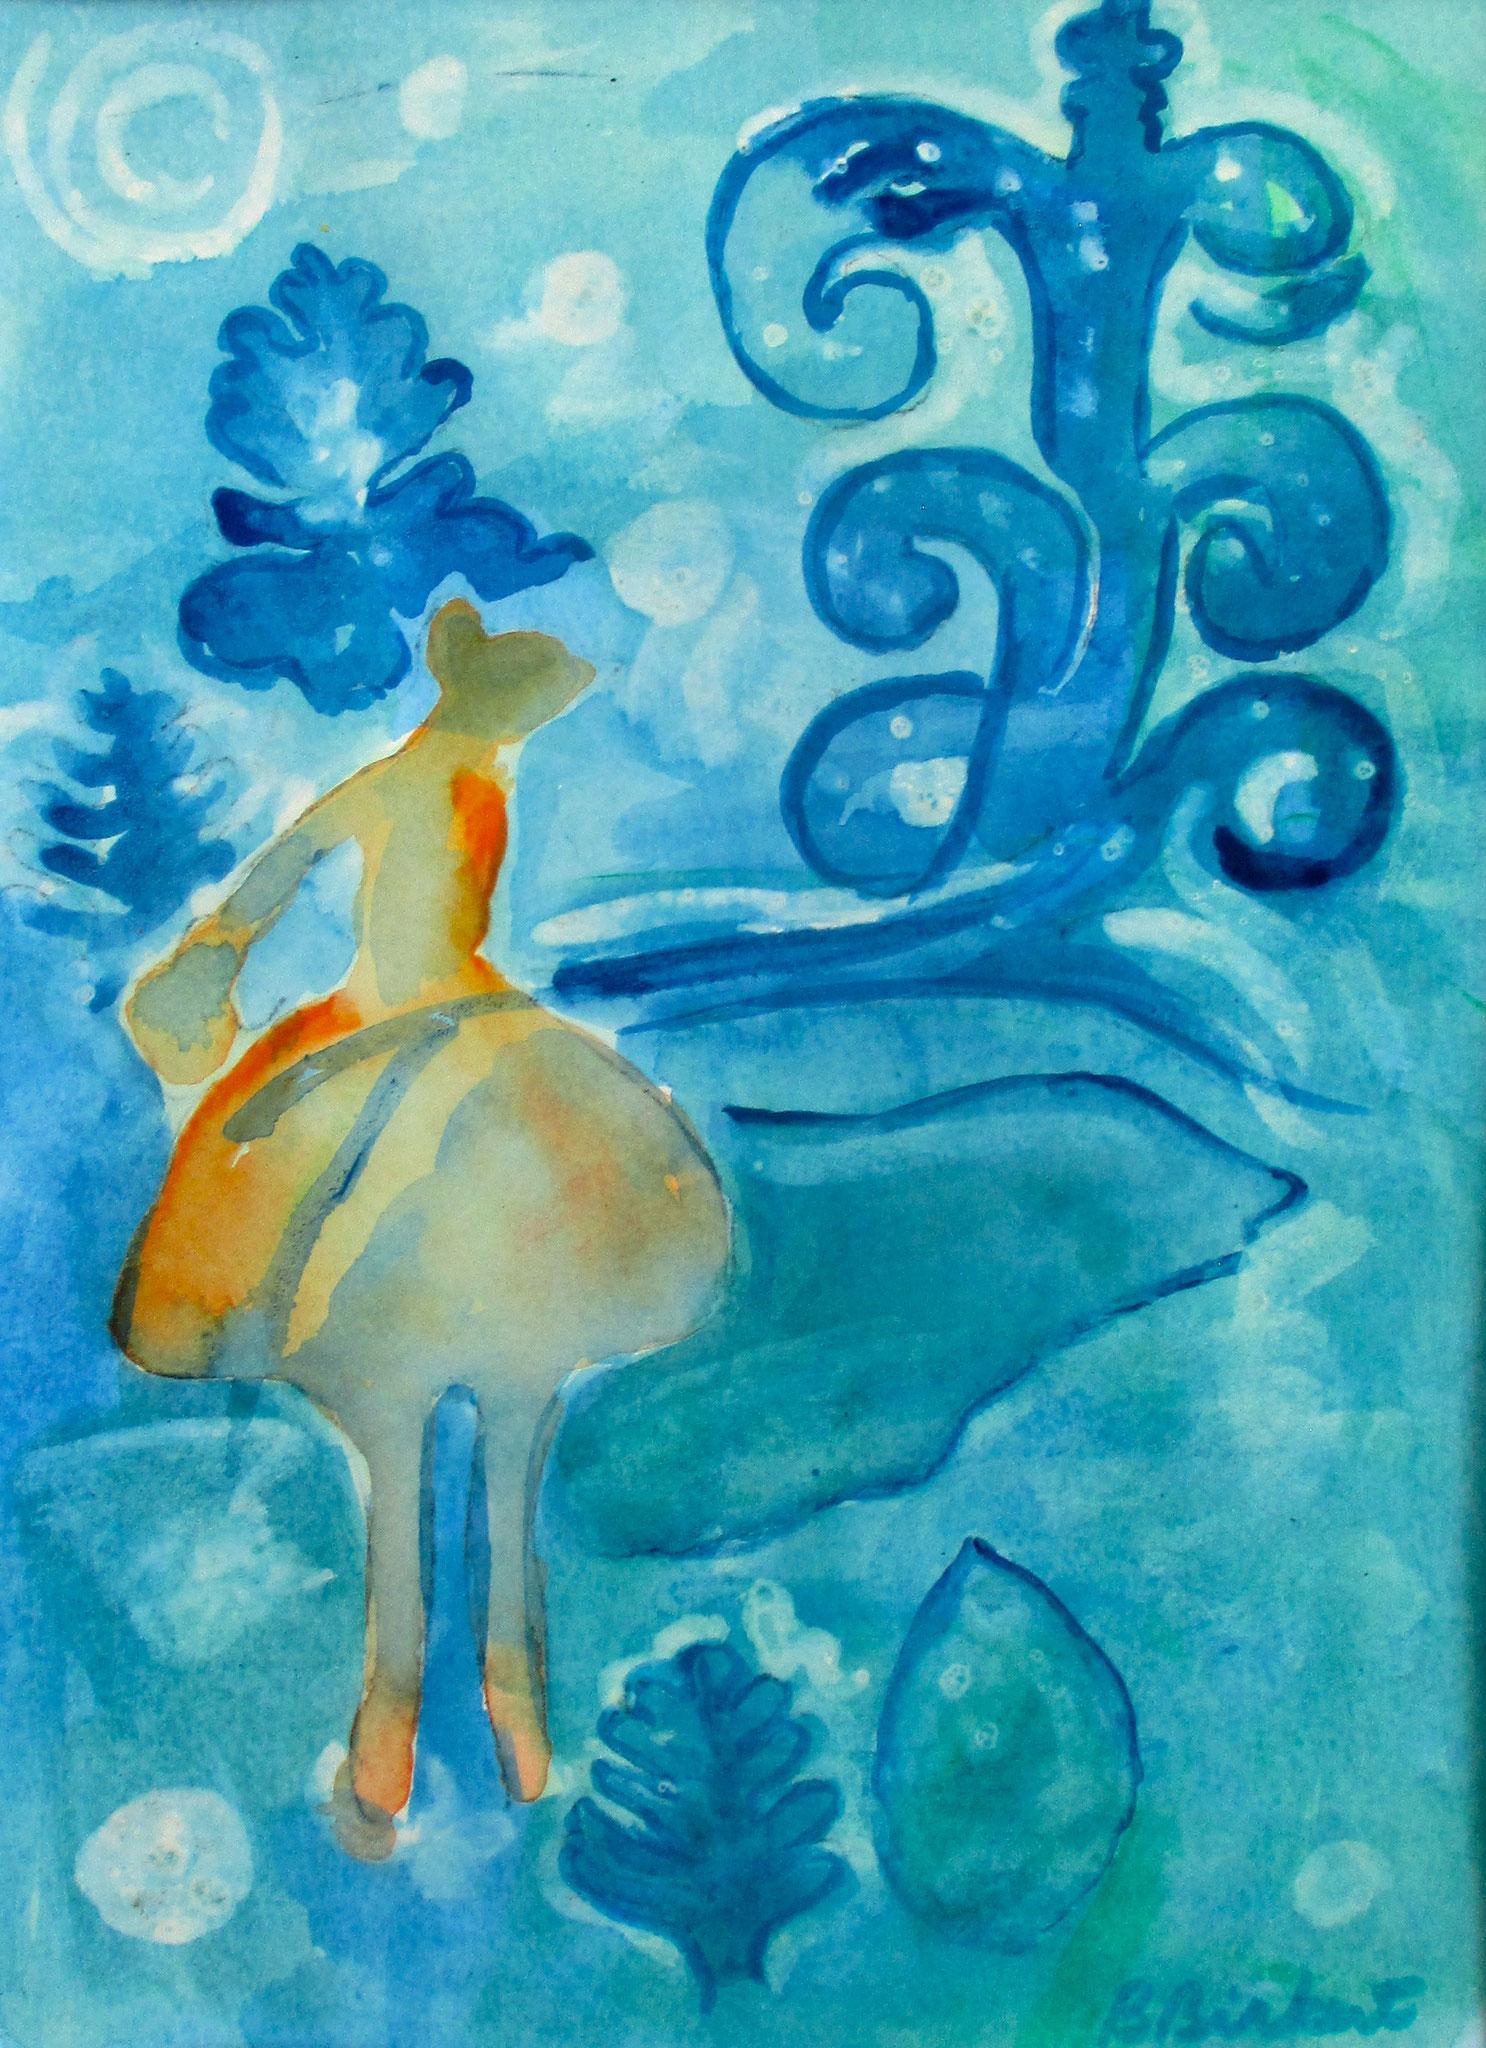 Moon Maiden, watercolor, 11 x 14